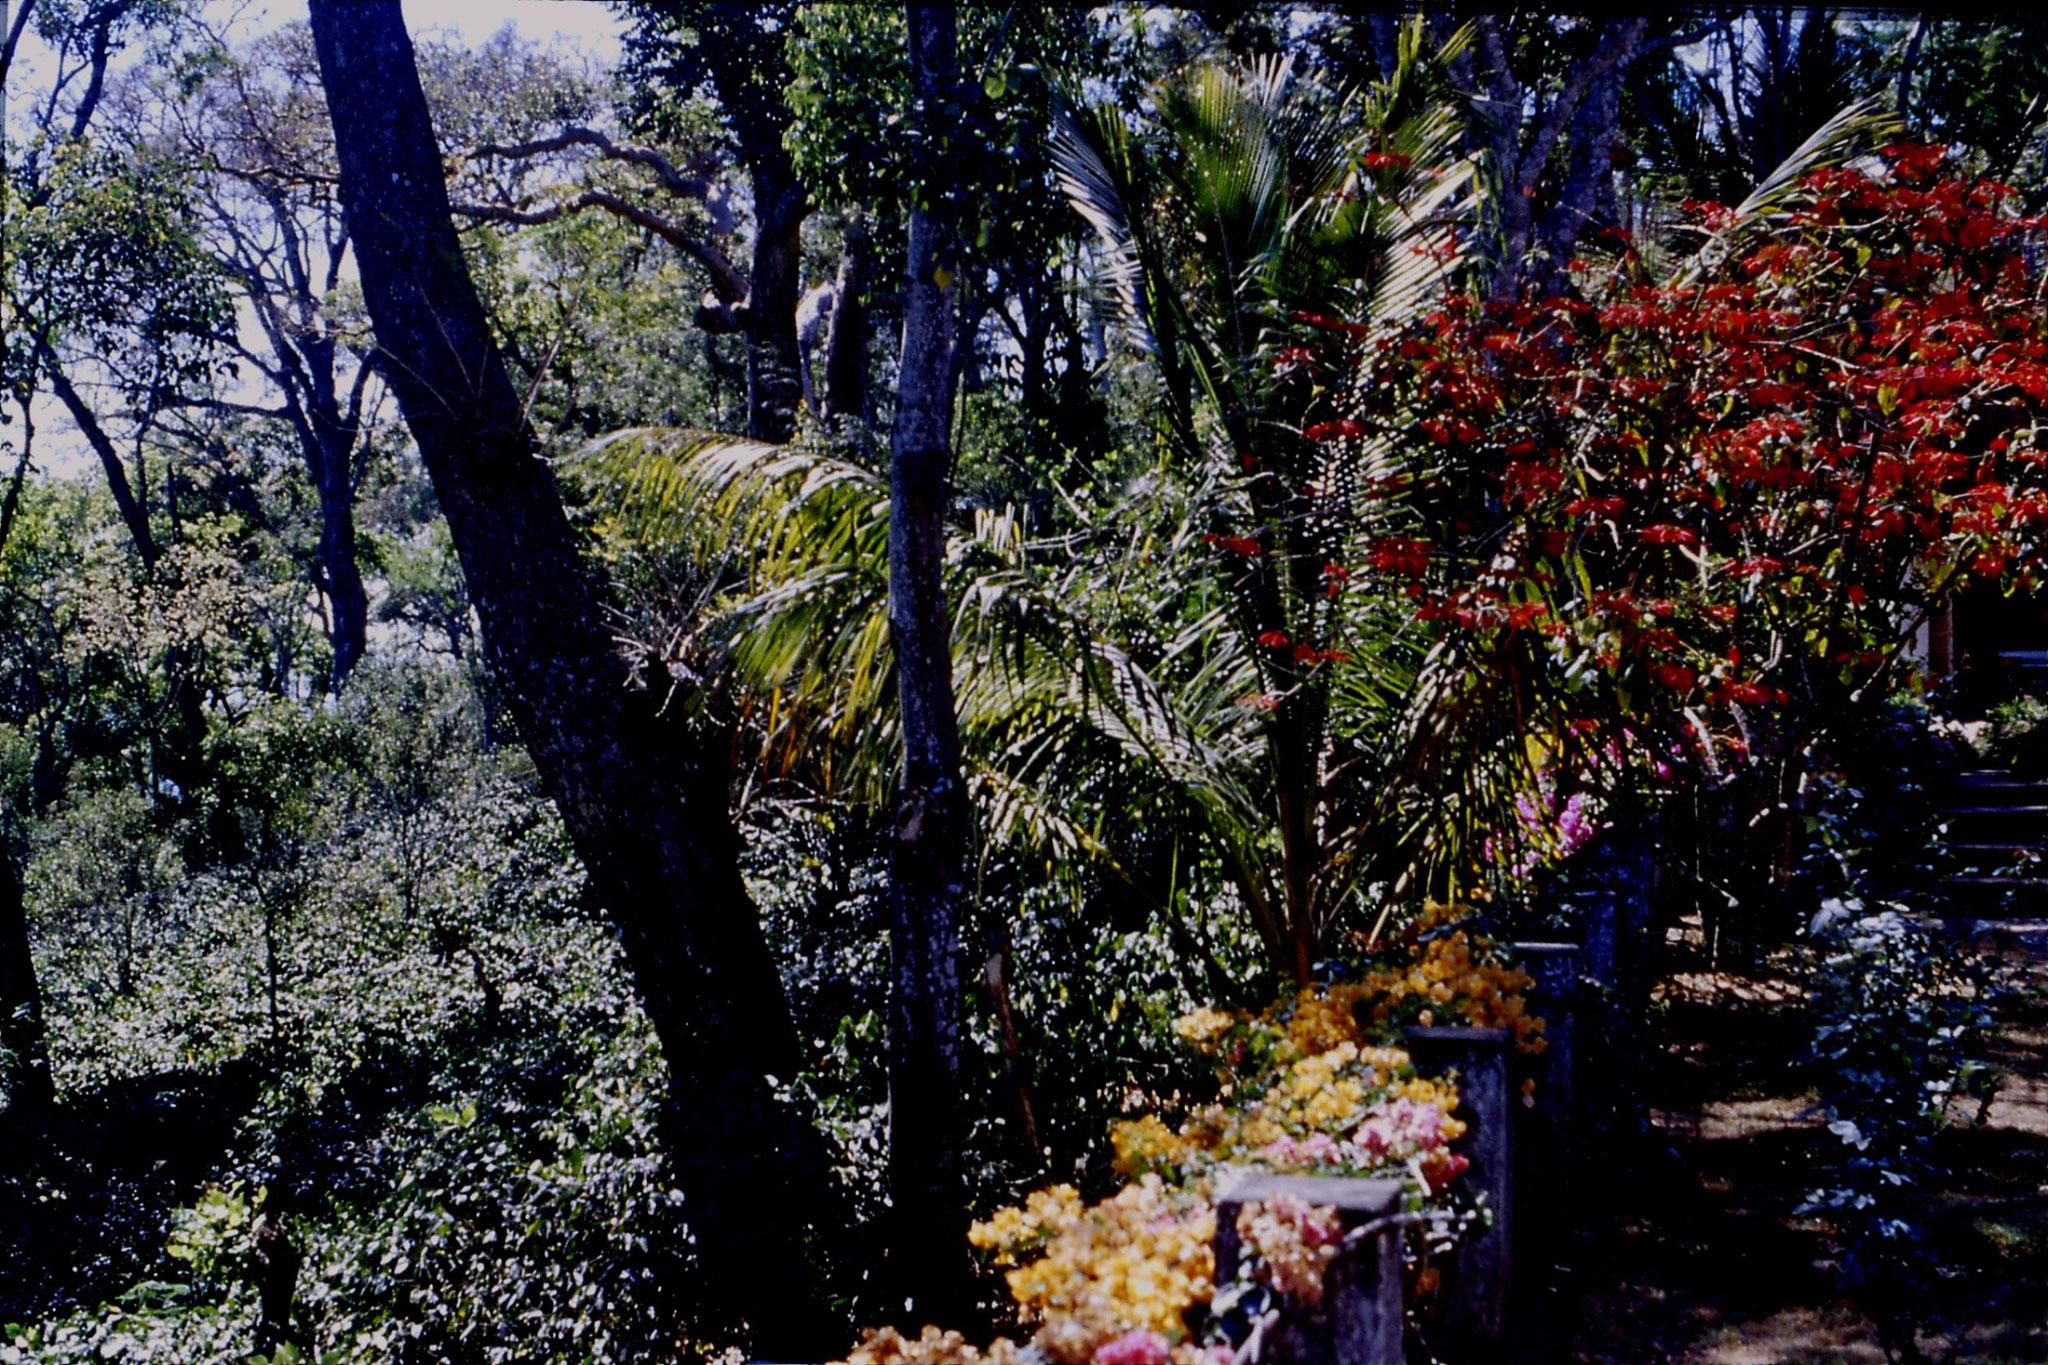 108/0: 8/3/1990 Suntikoppa - garden with coffee bushes